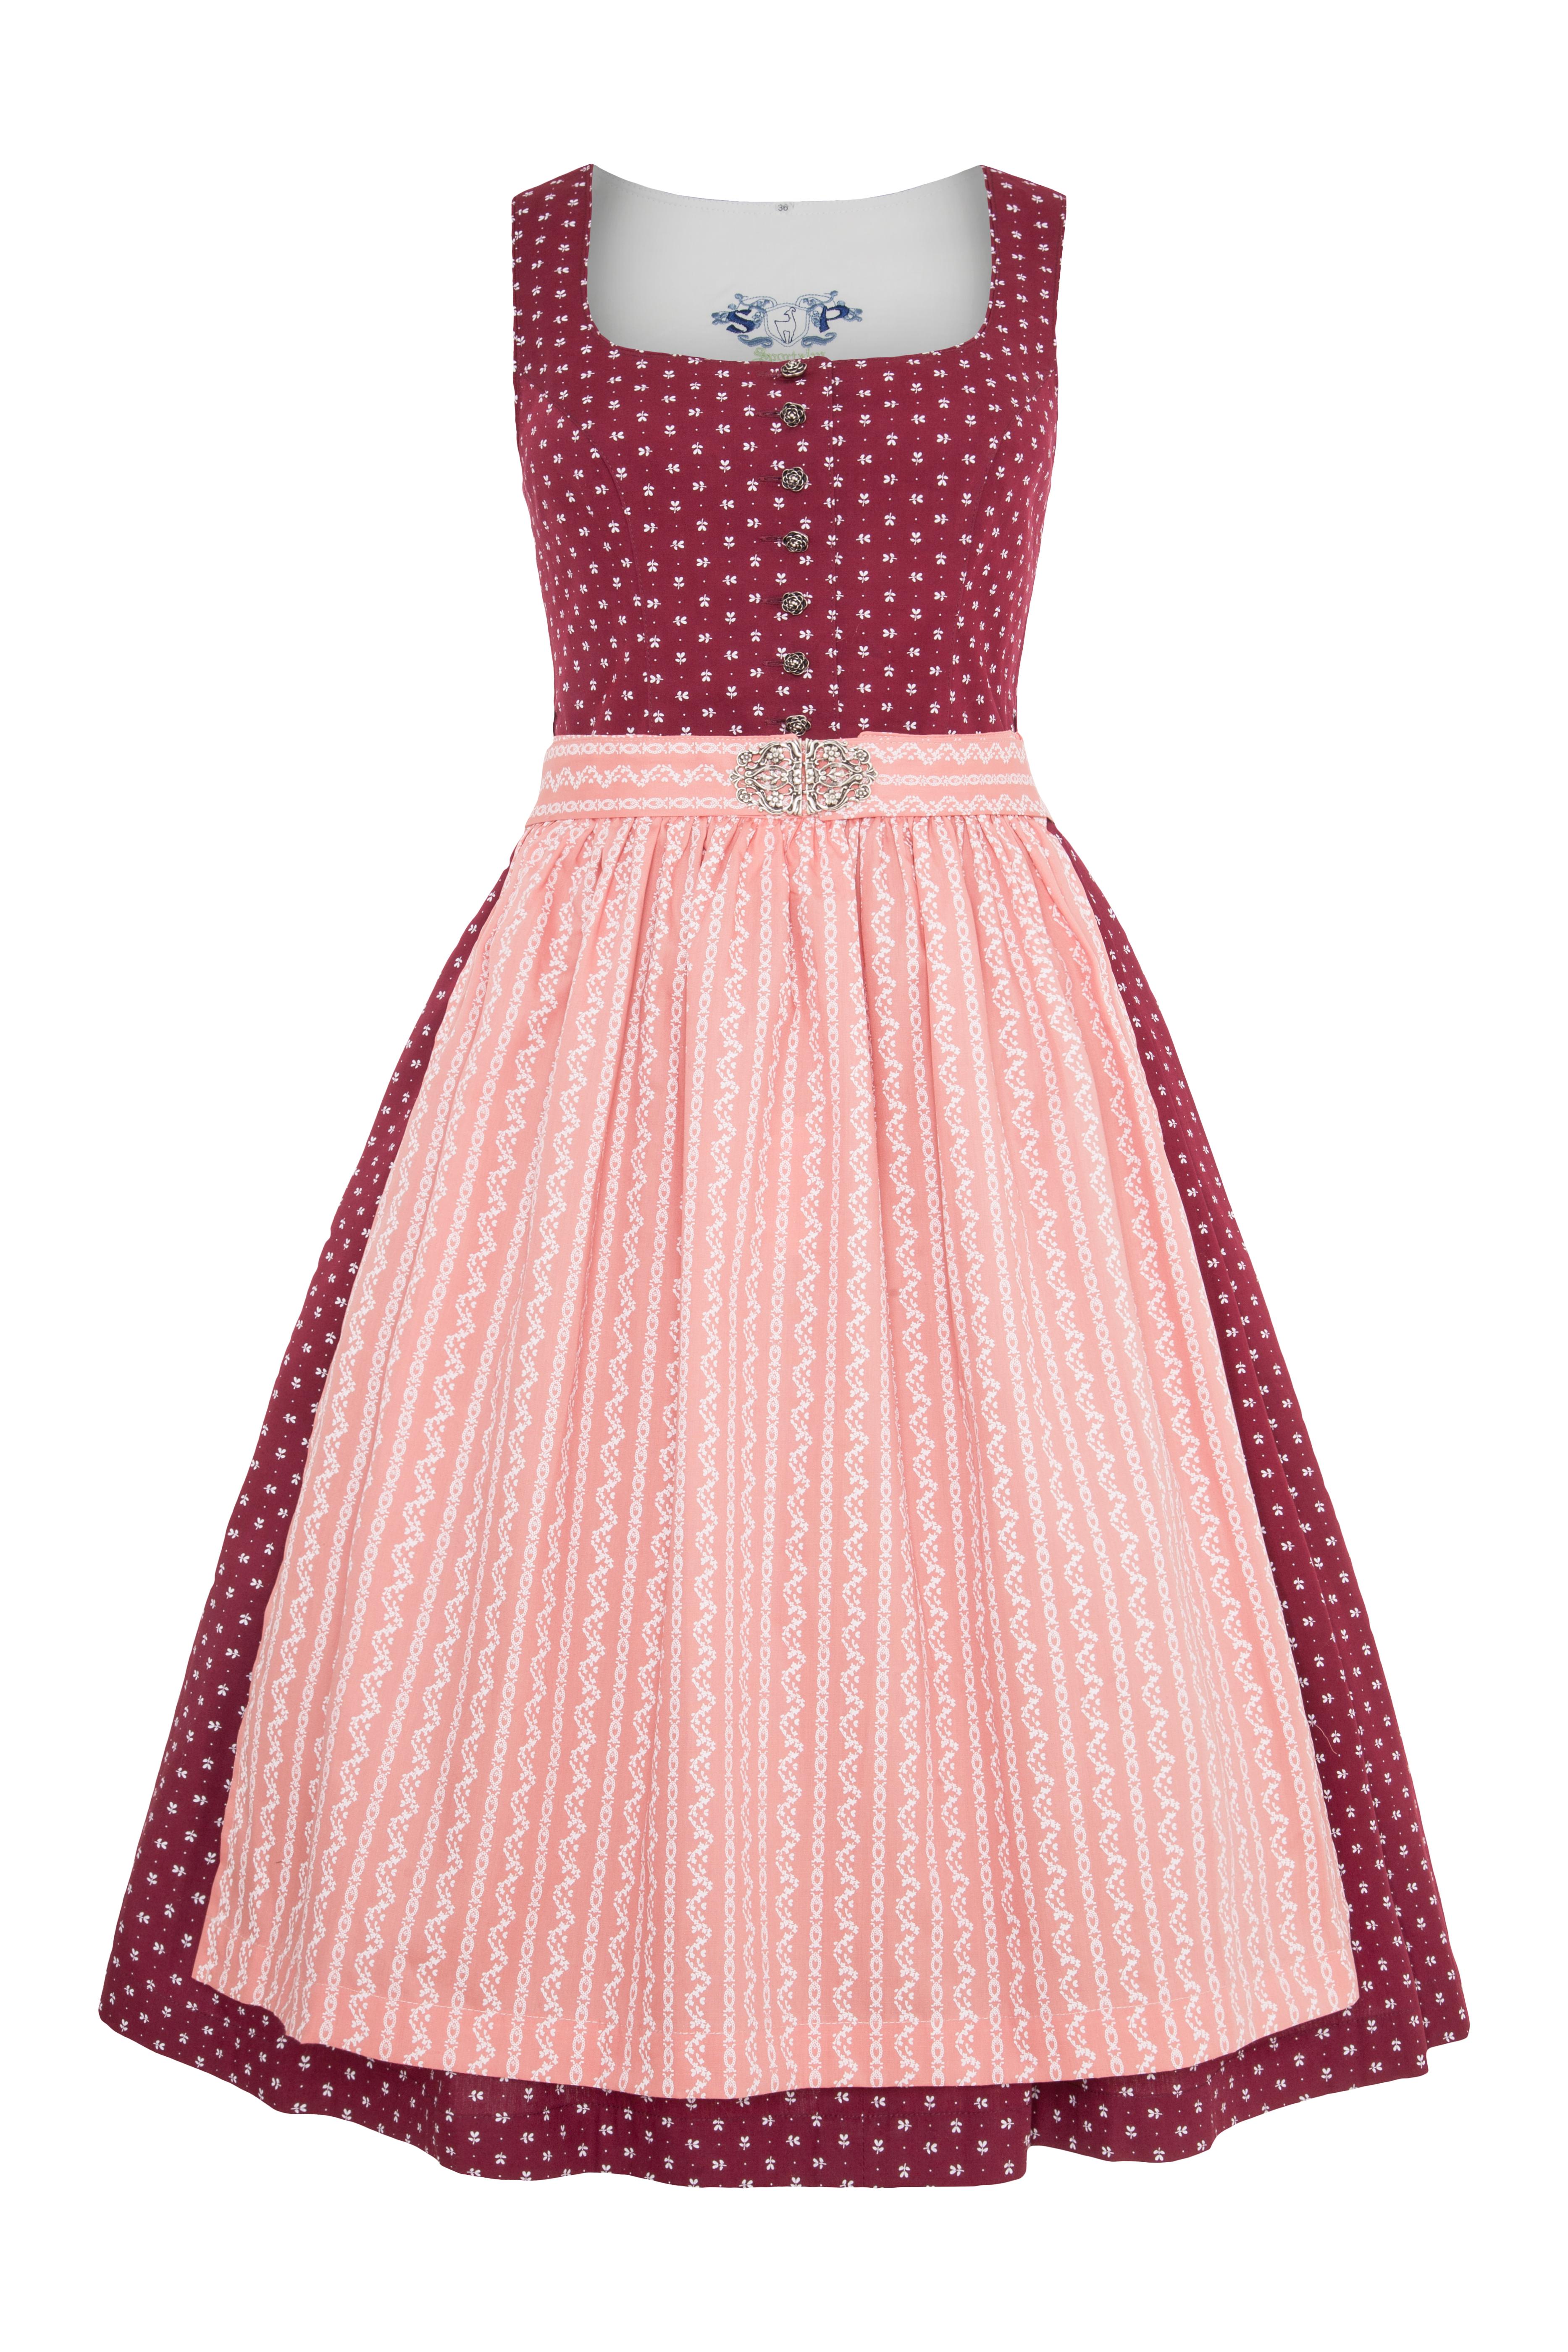 6b054c833f5af2 Midi Dirndl Kitzingen, brombeer/rosa | Gwandlalm | online bestellen